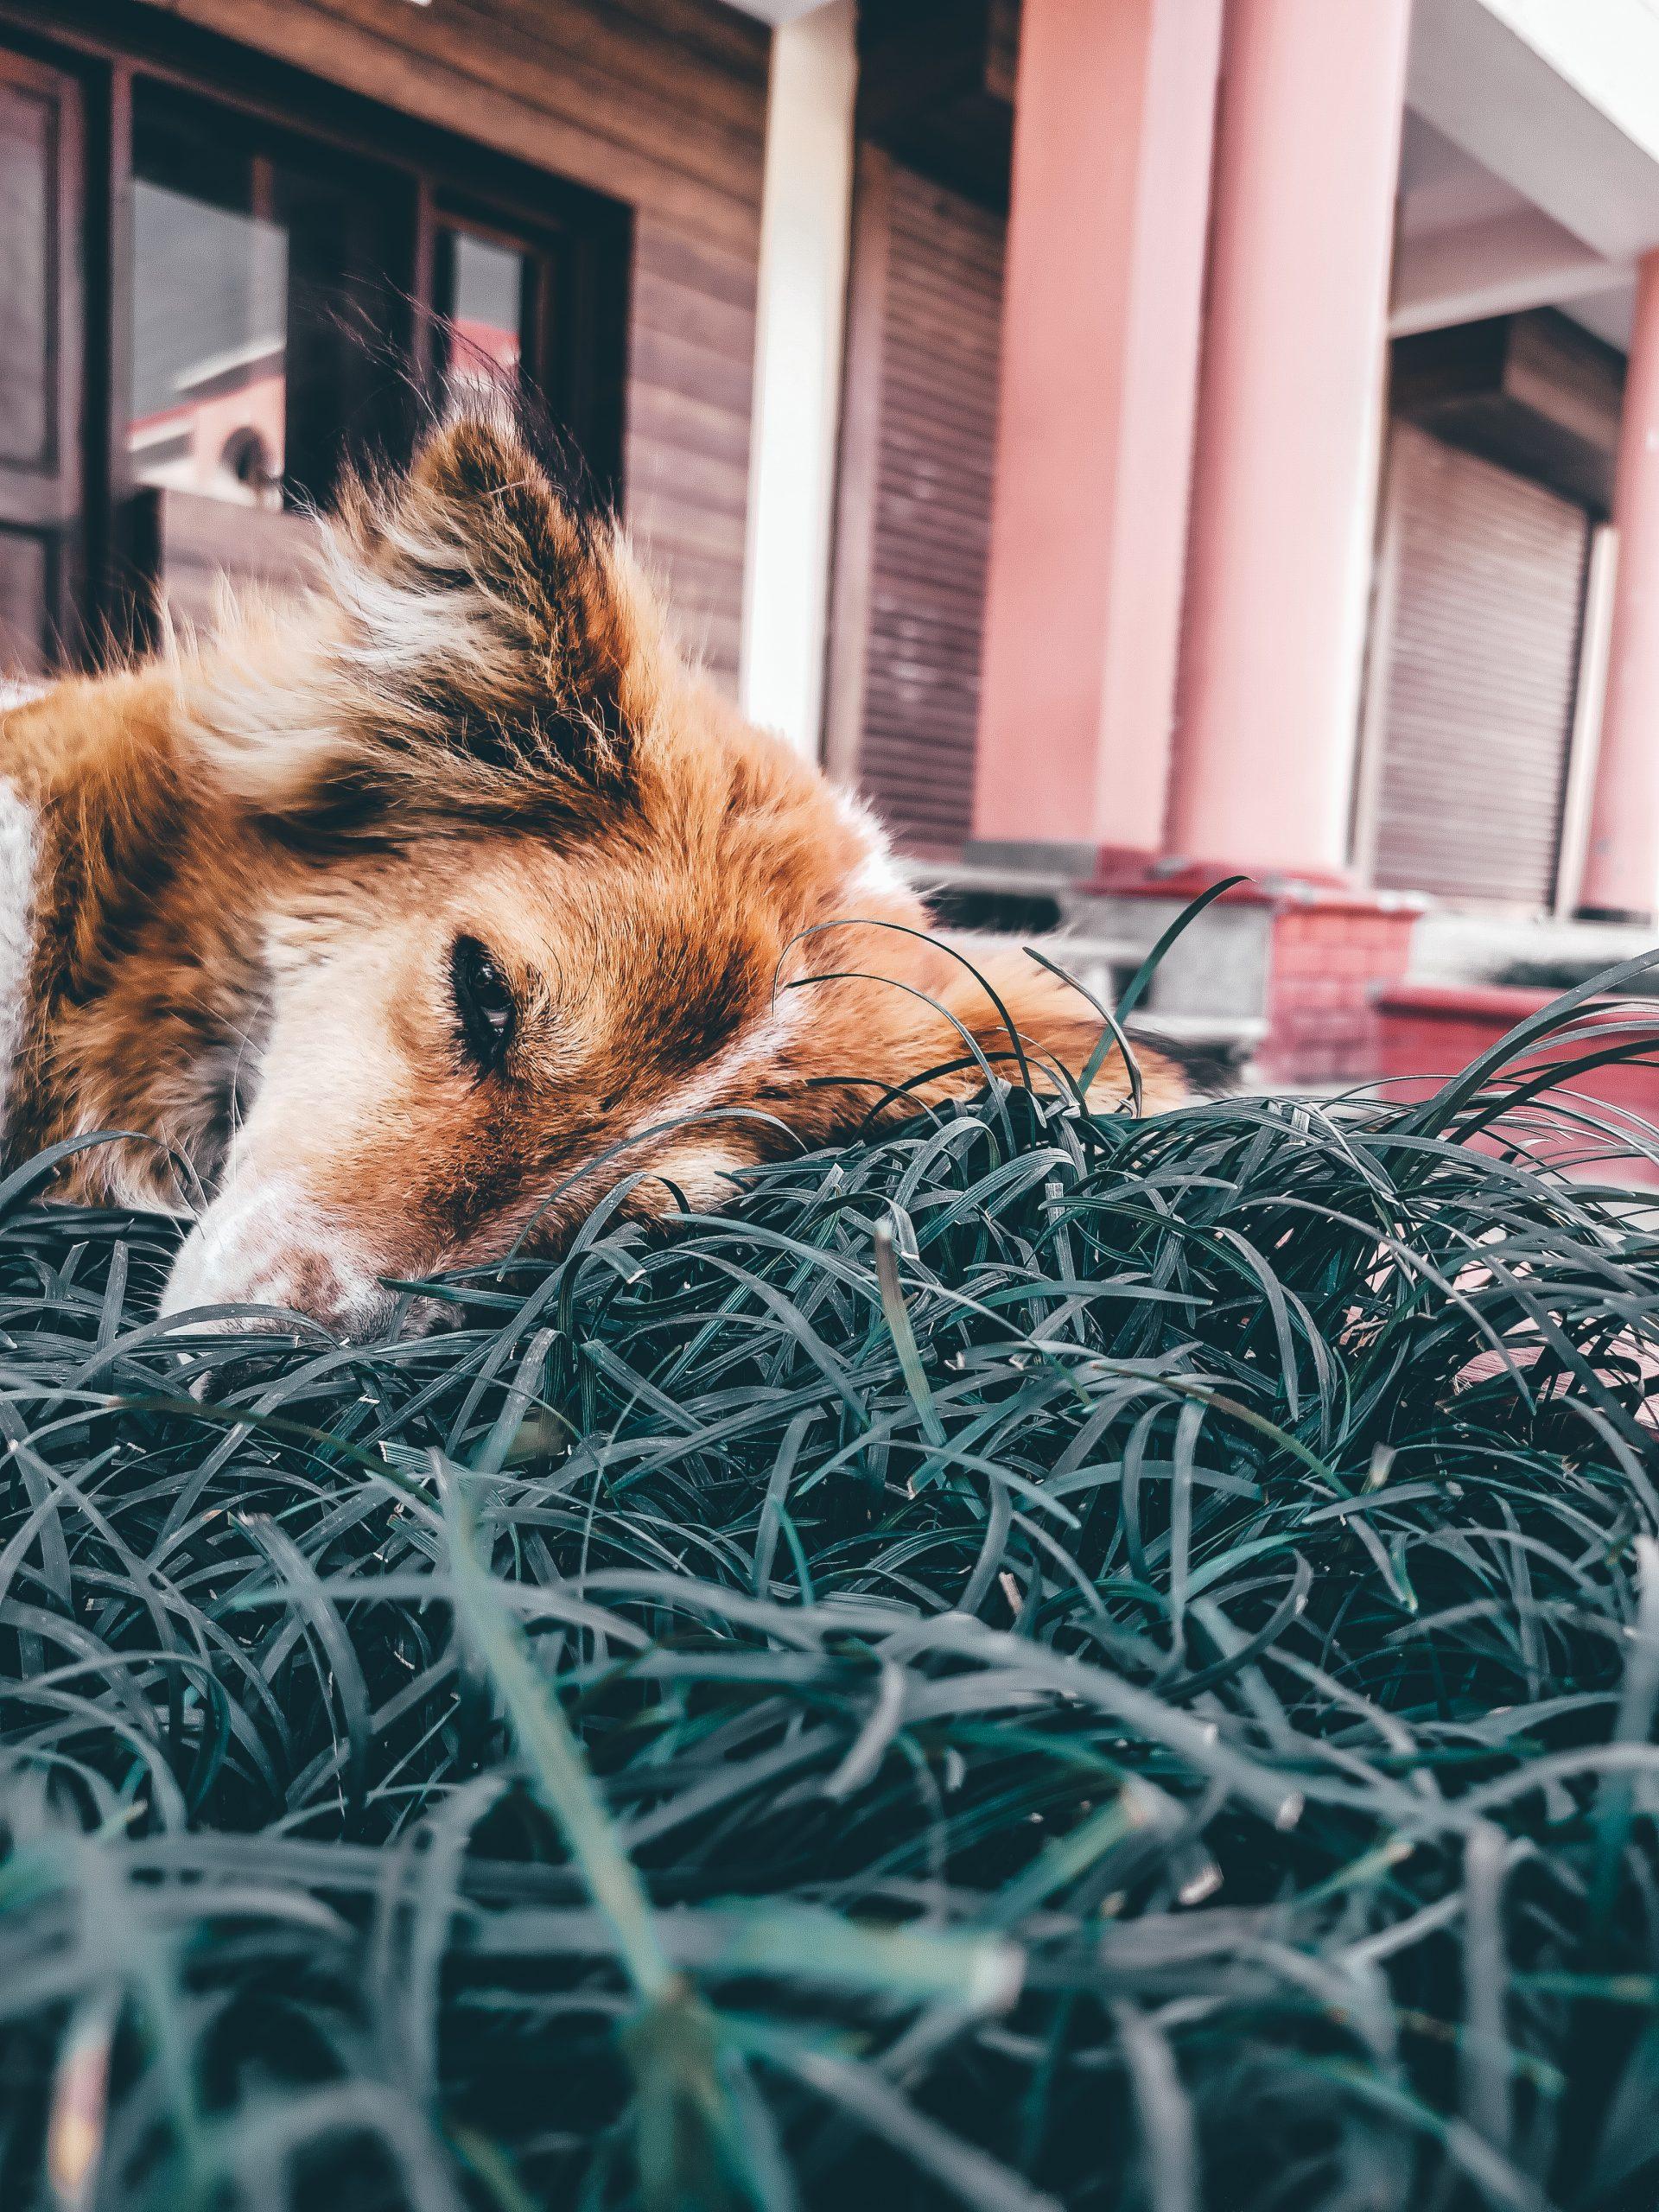 A dog sleeping on the grass